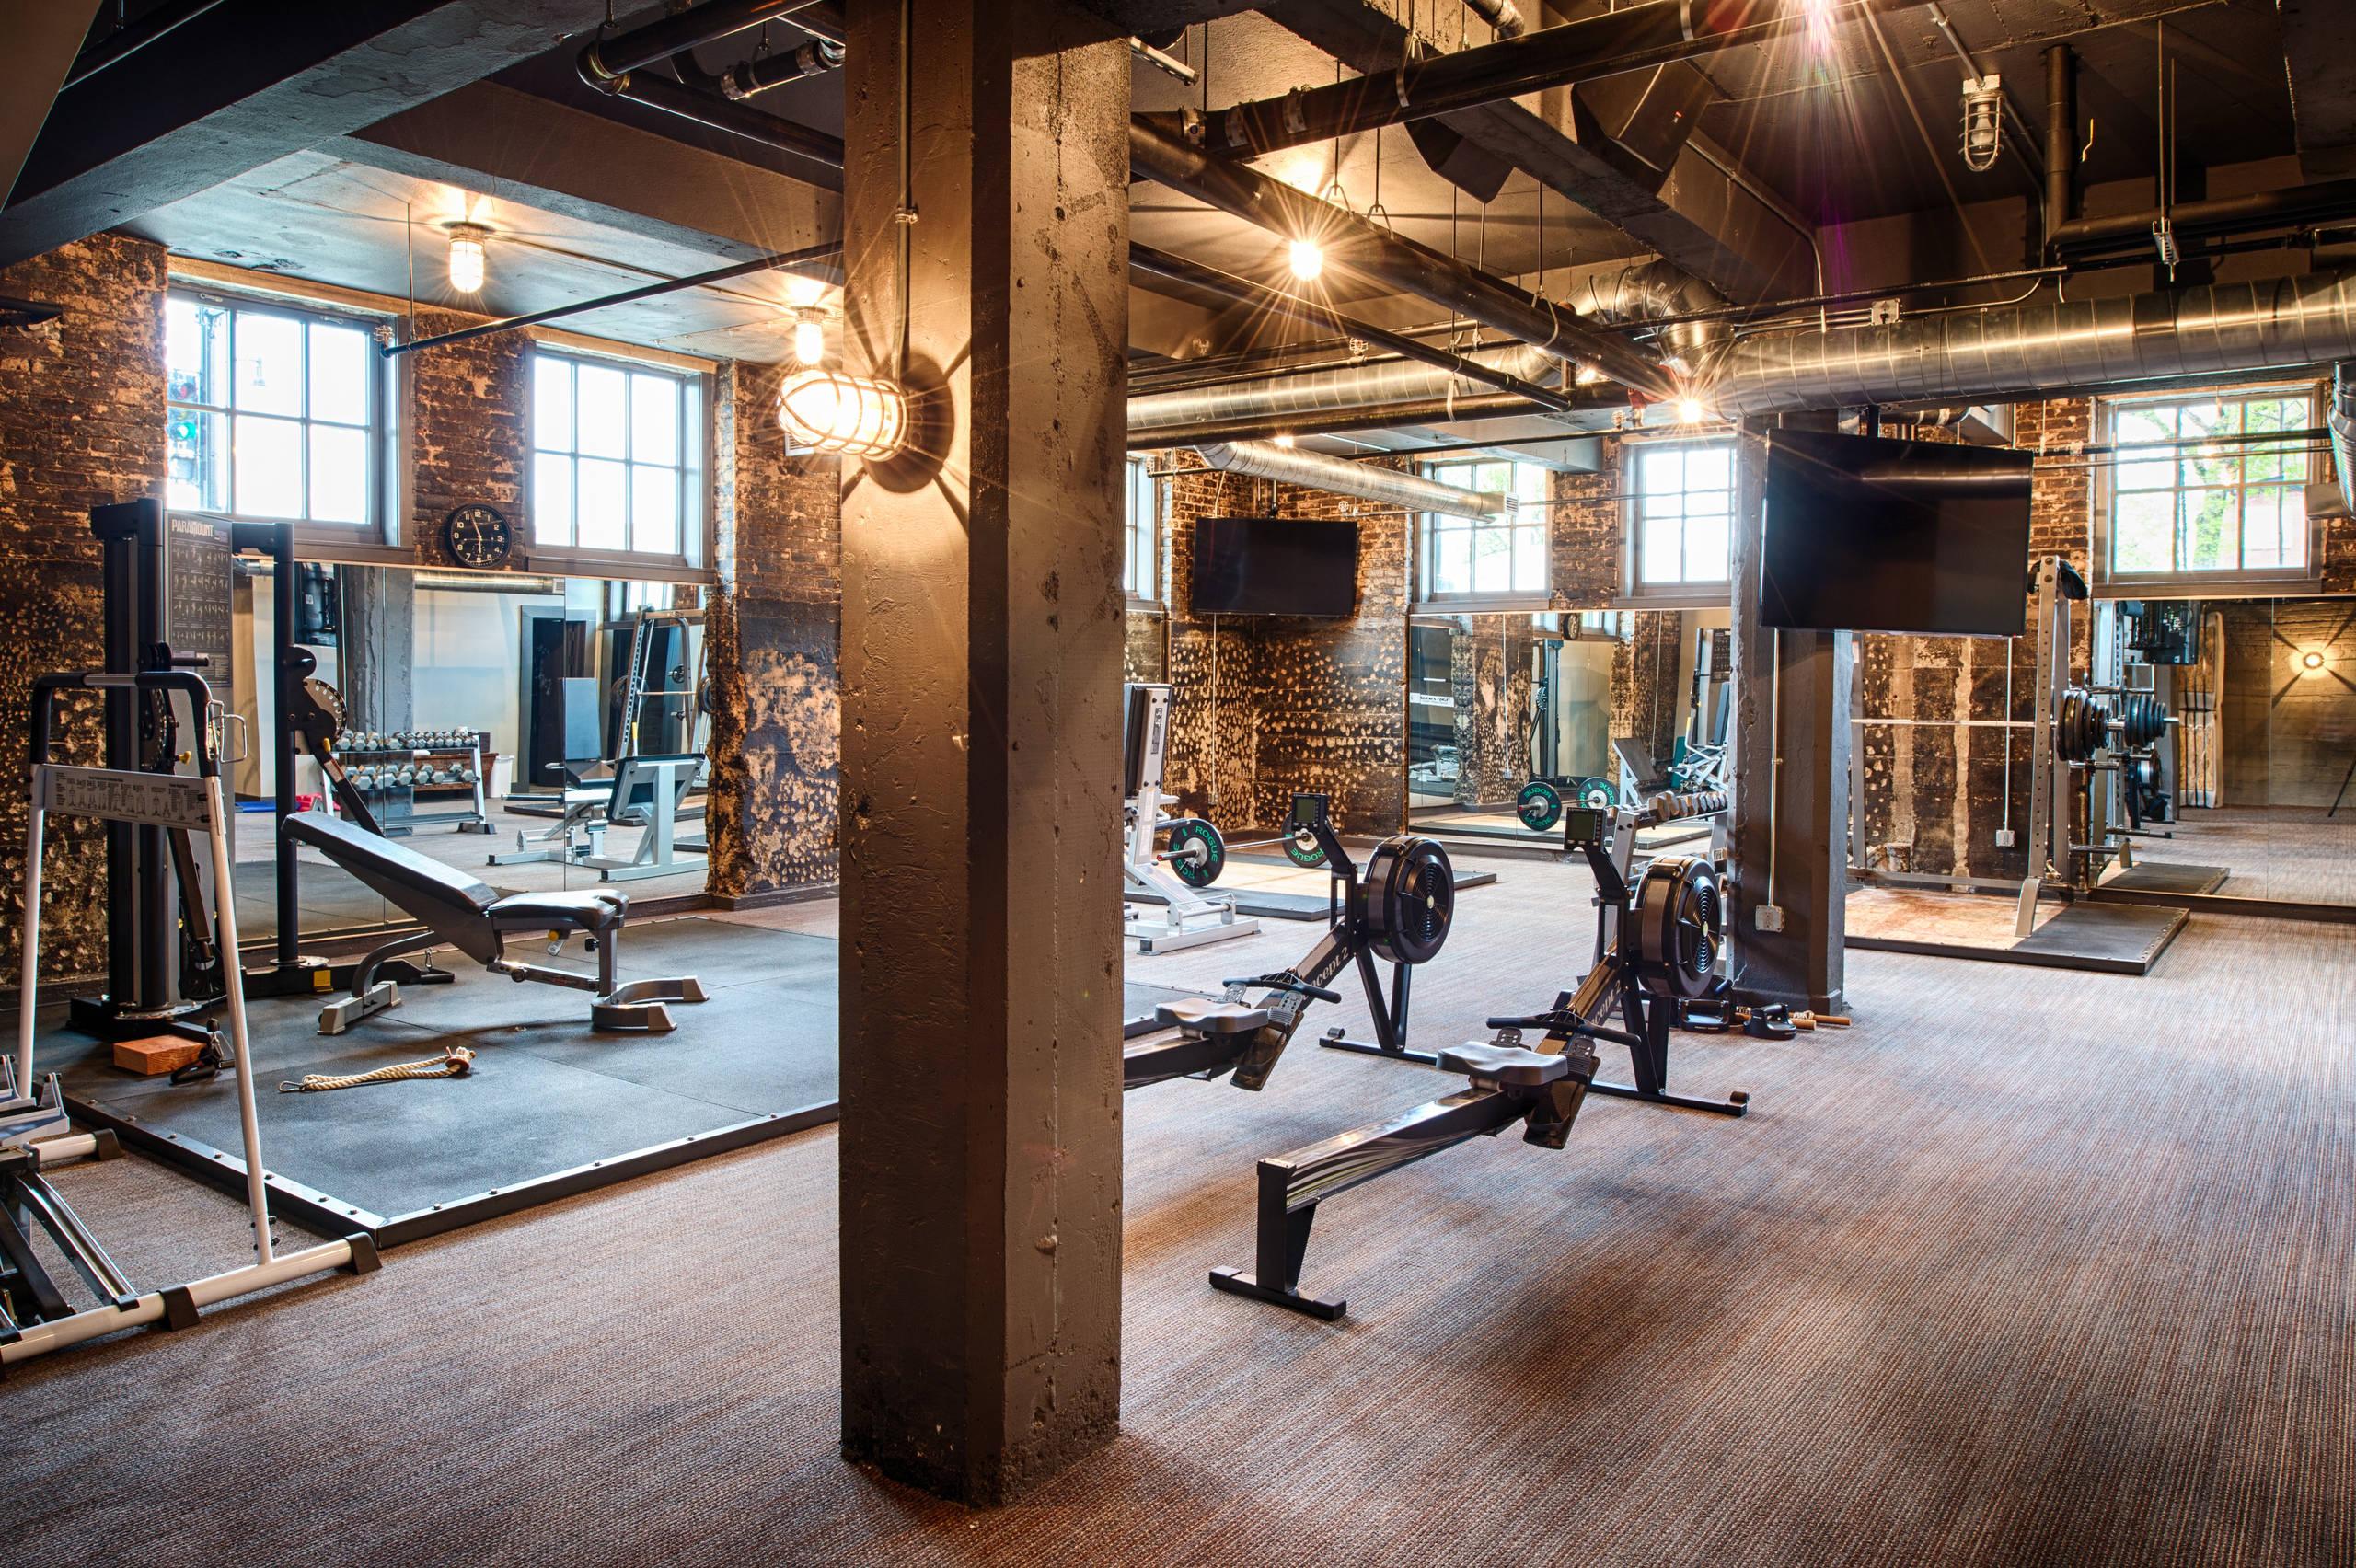 Fargo Laundry Industrial Home Gym